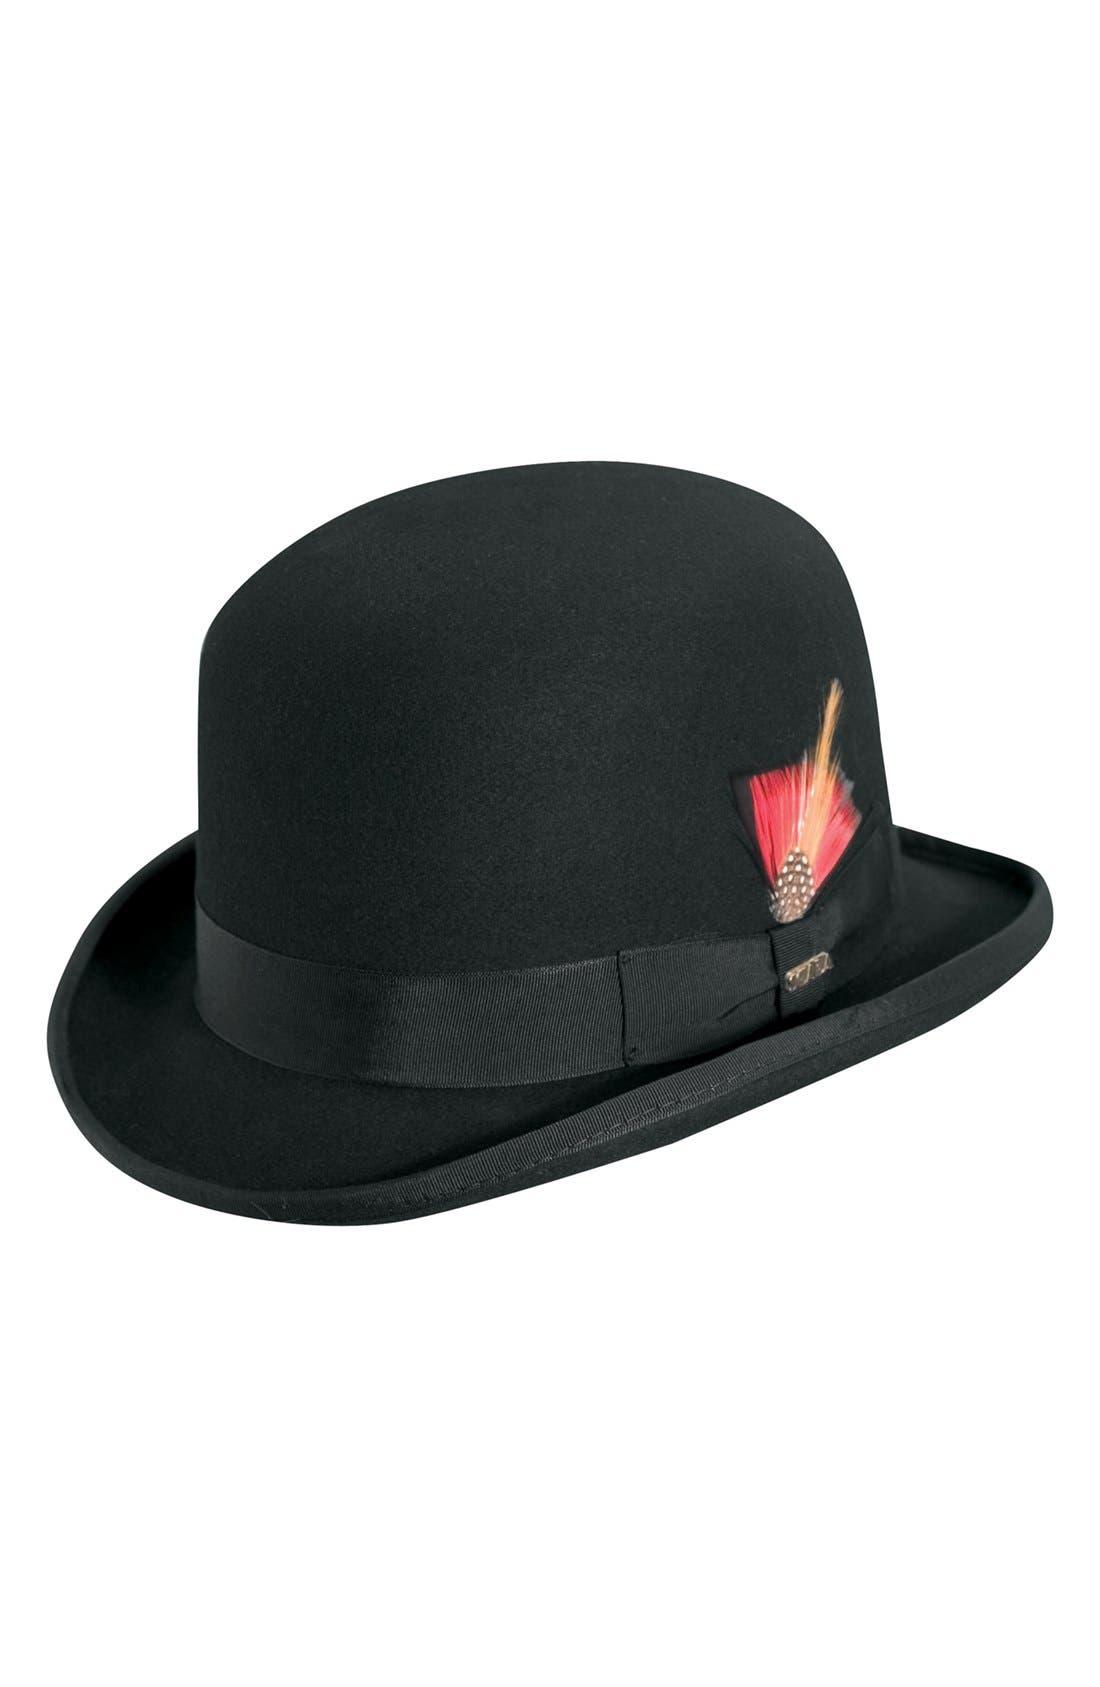 Main Image - Scala 'Classico' Wool Felt Derby Hat